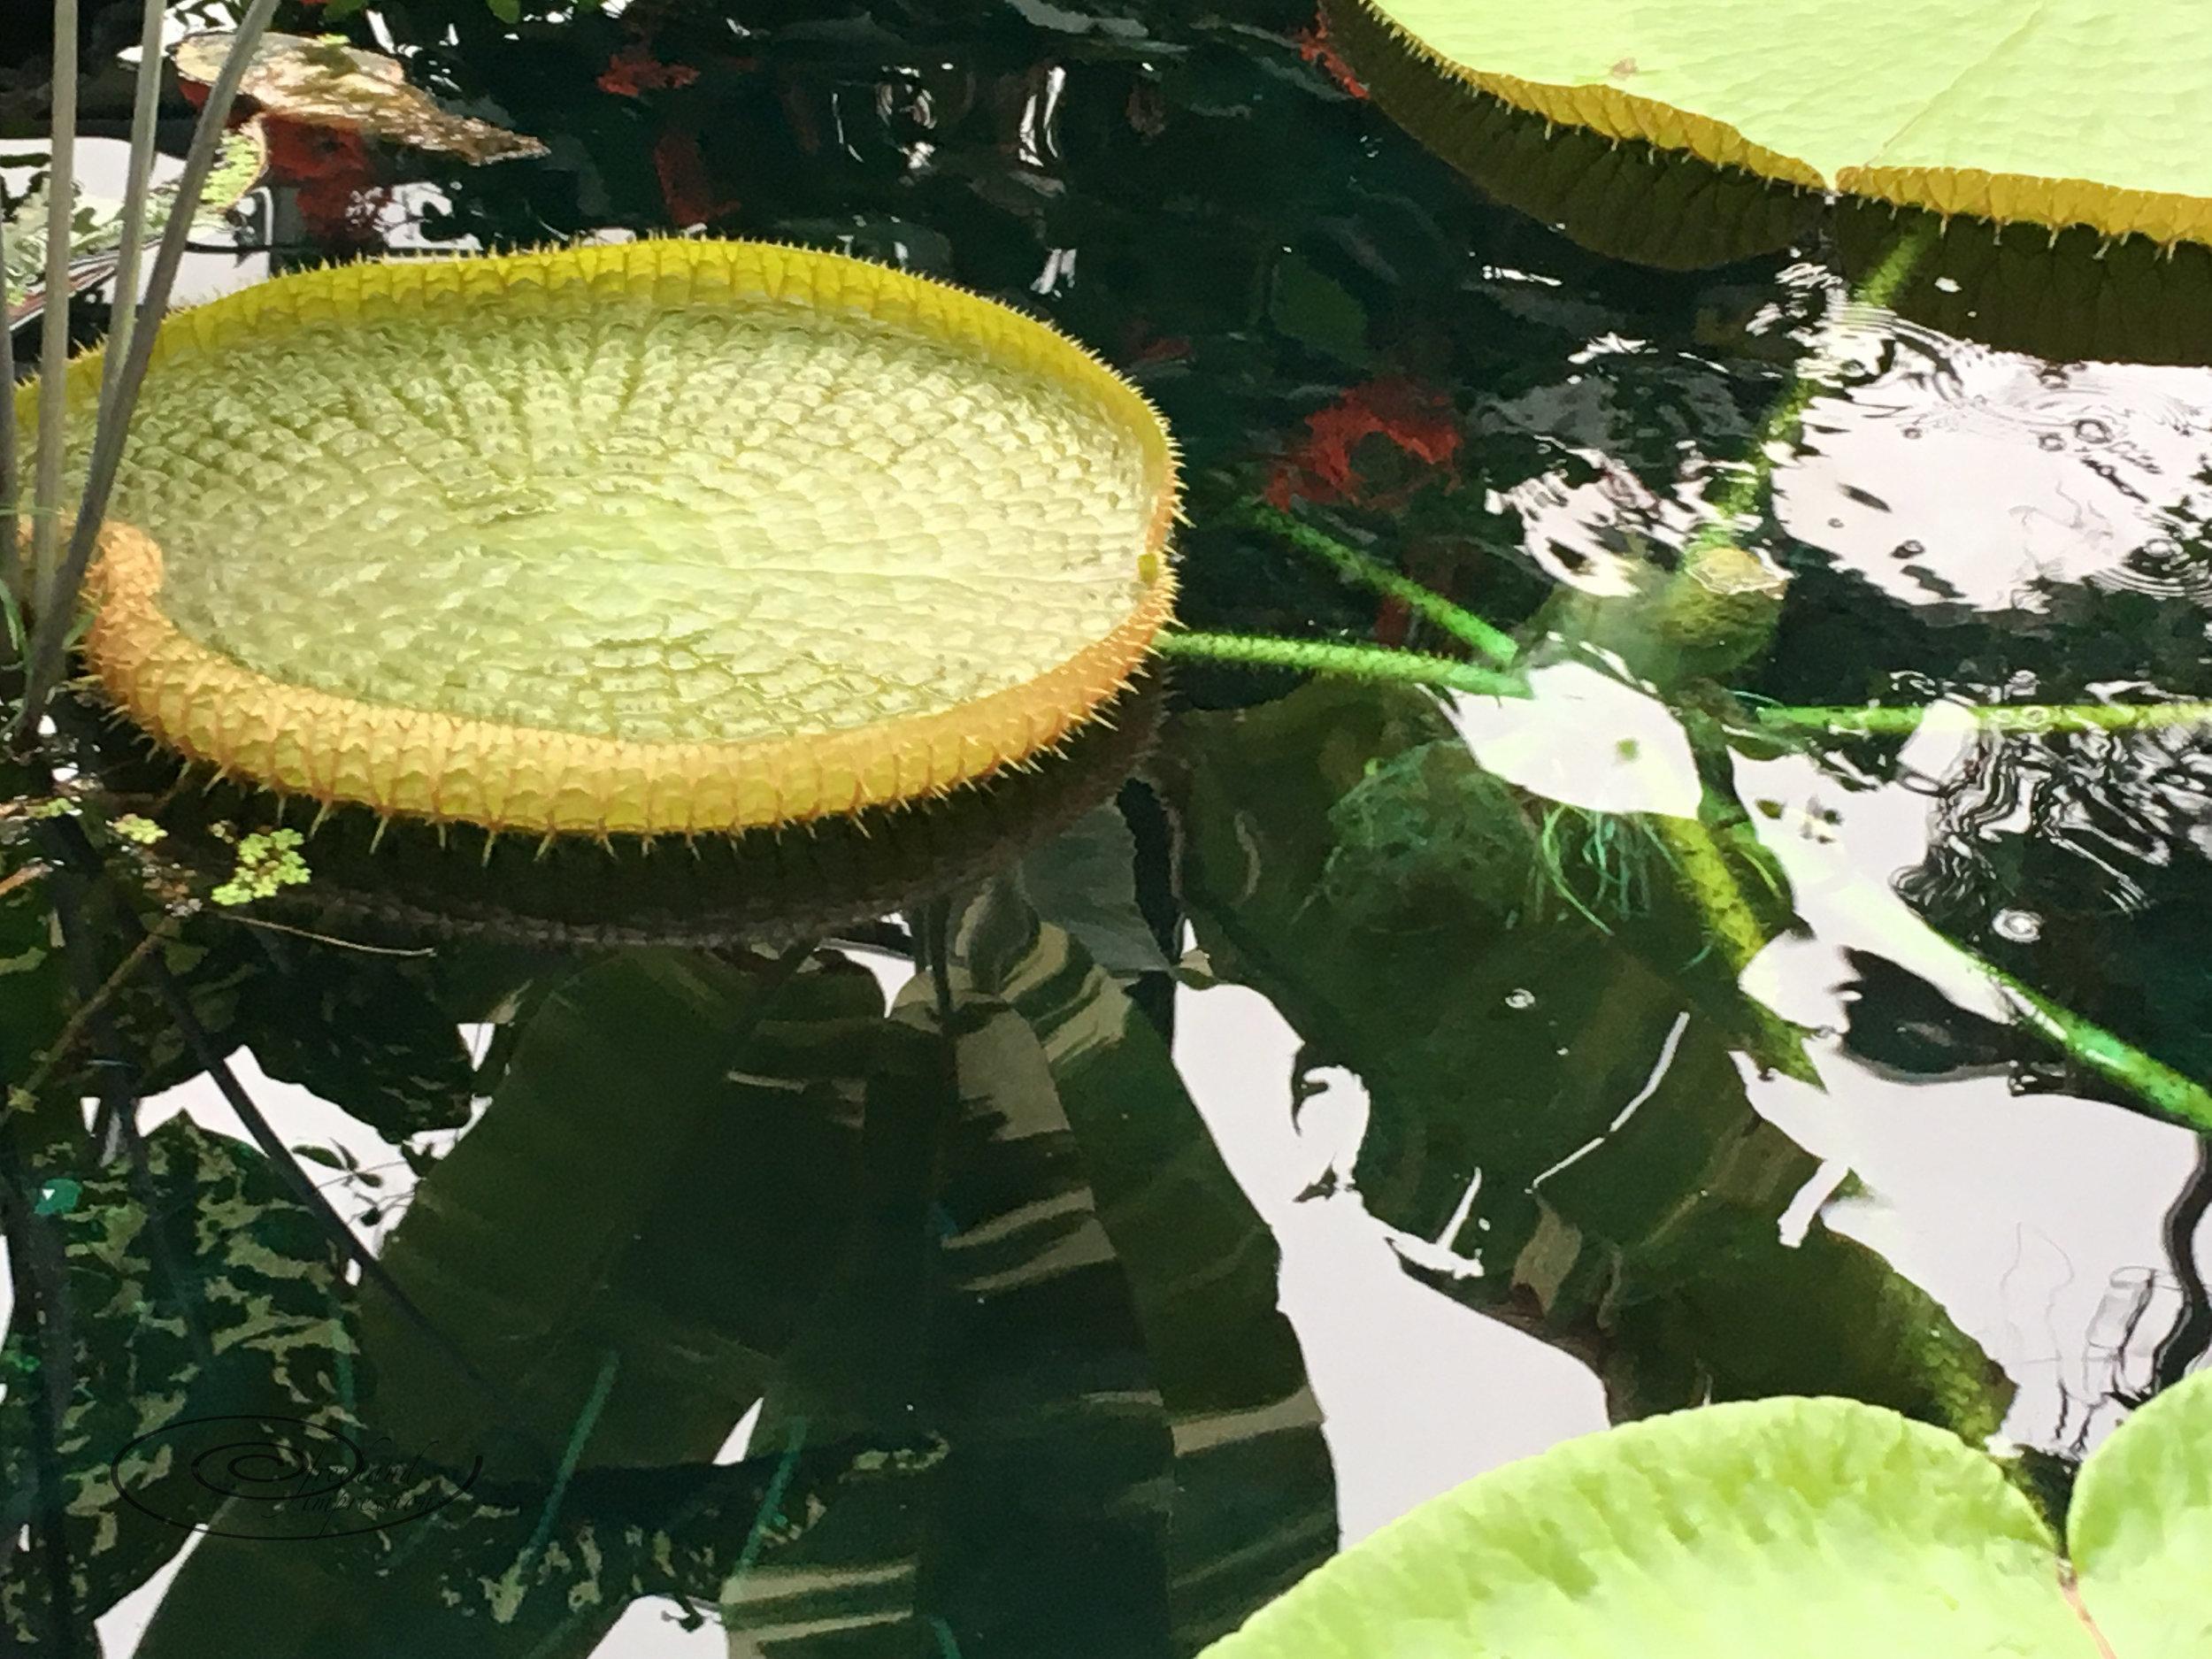 amazon lily pads-1.jpg